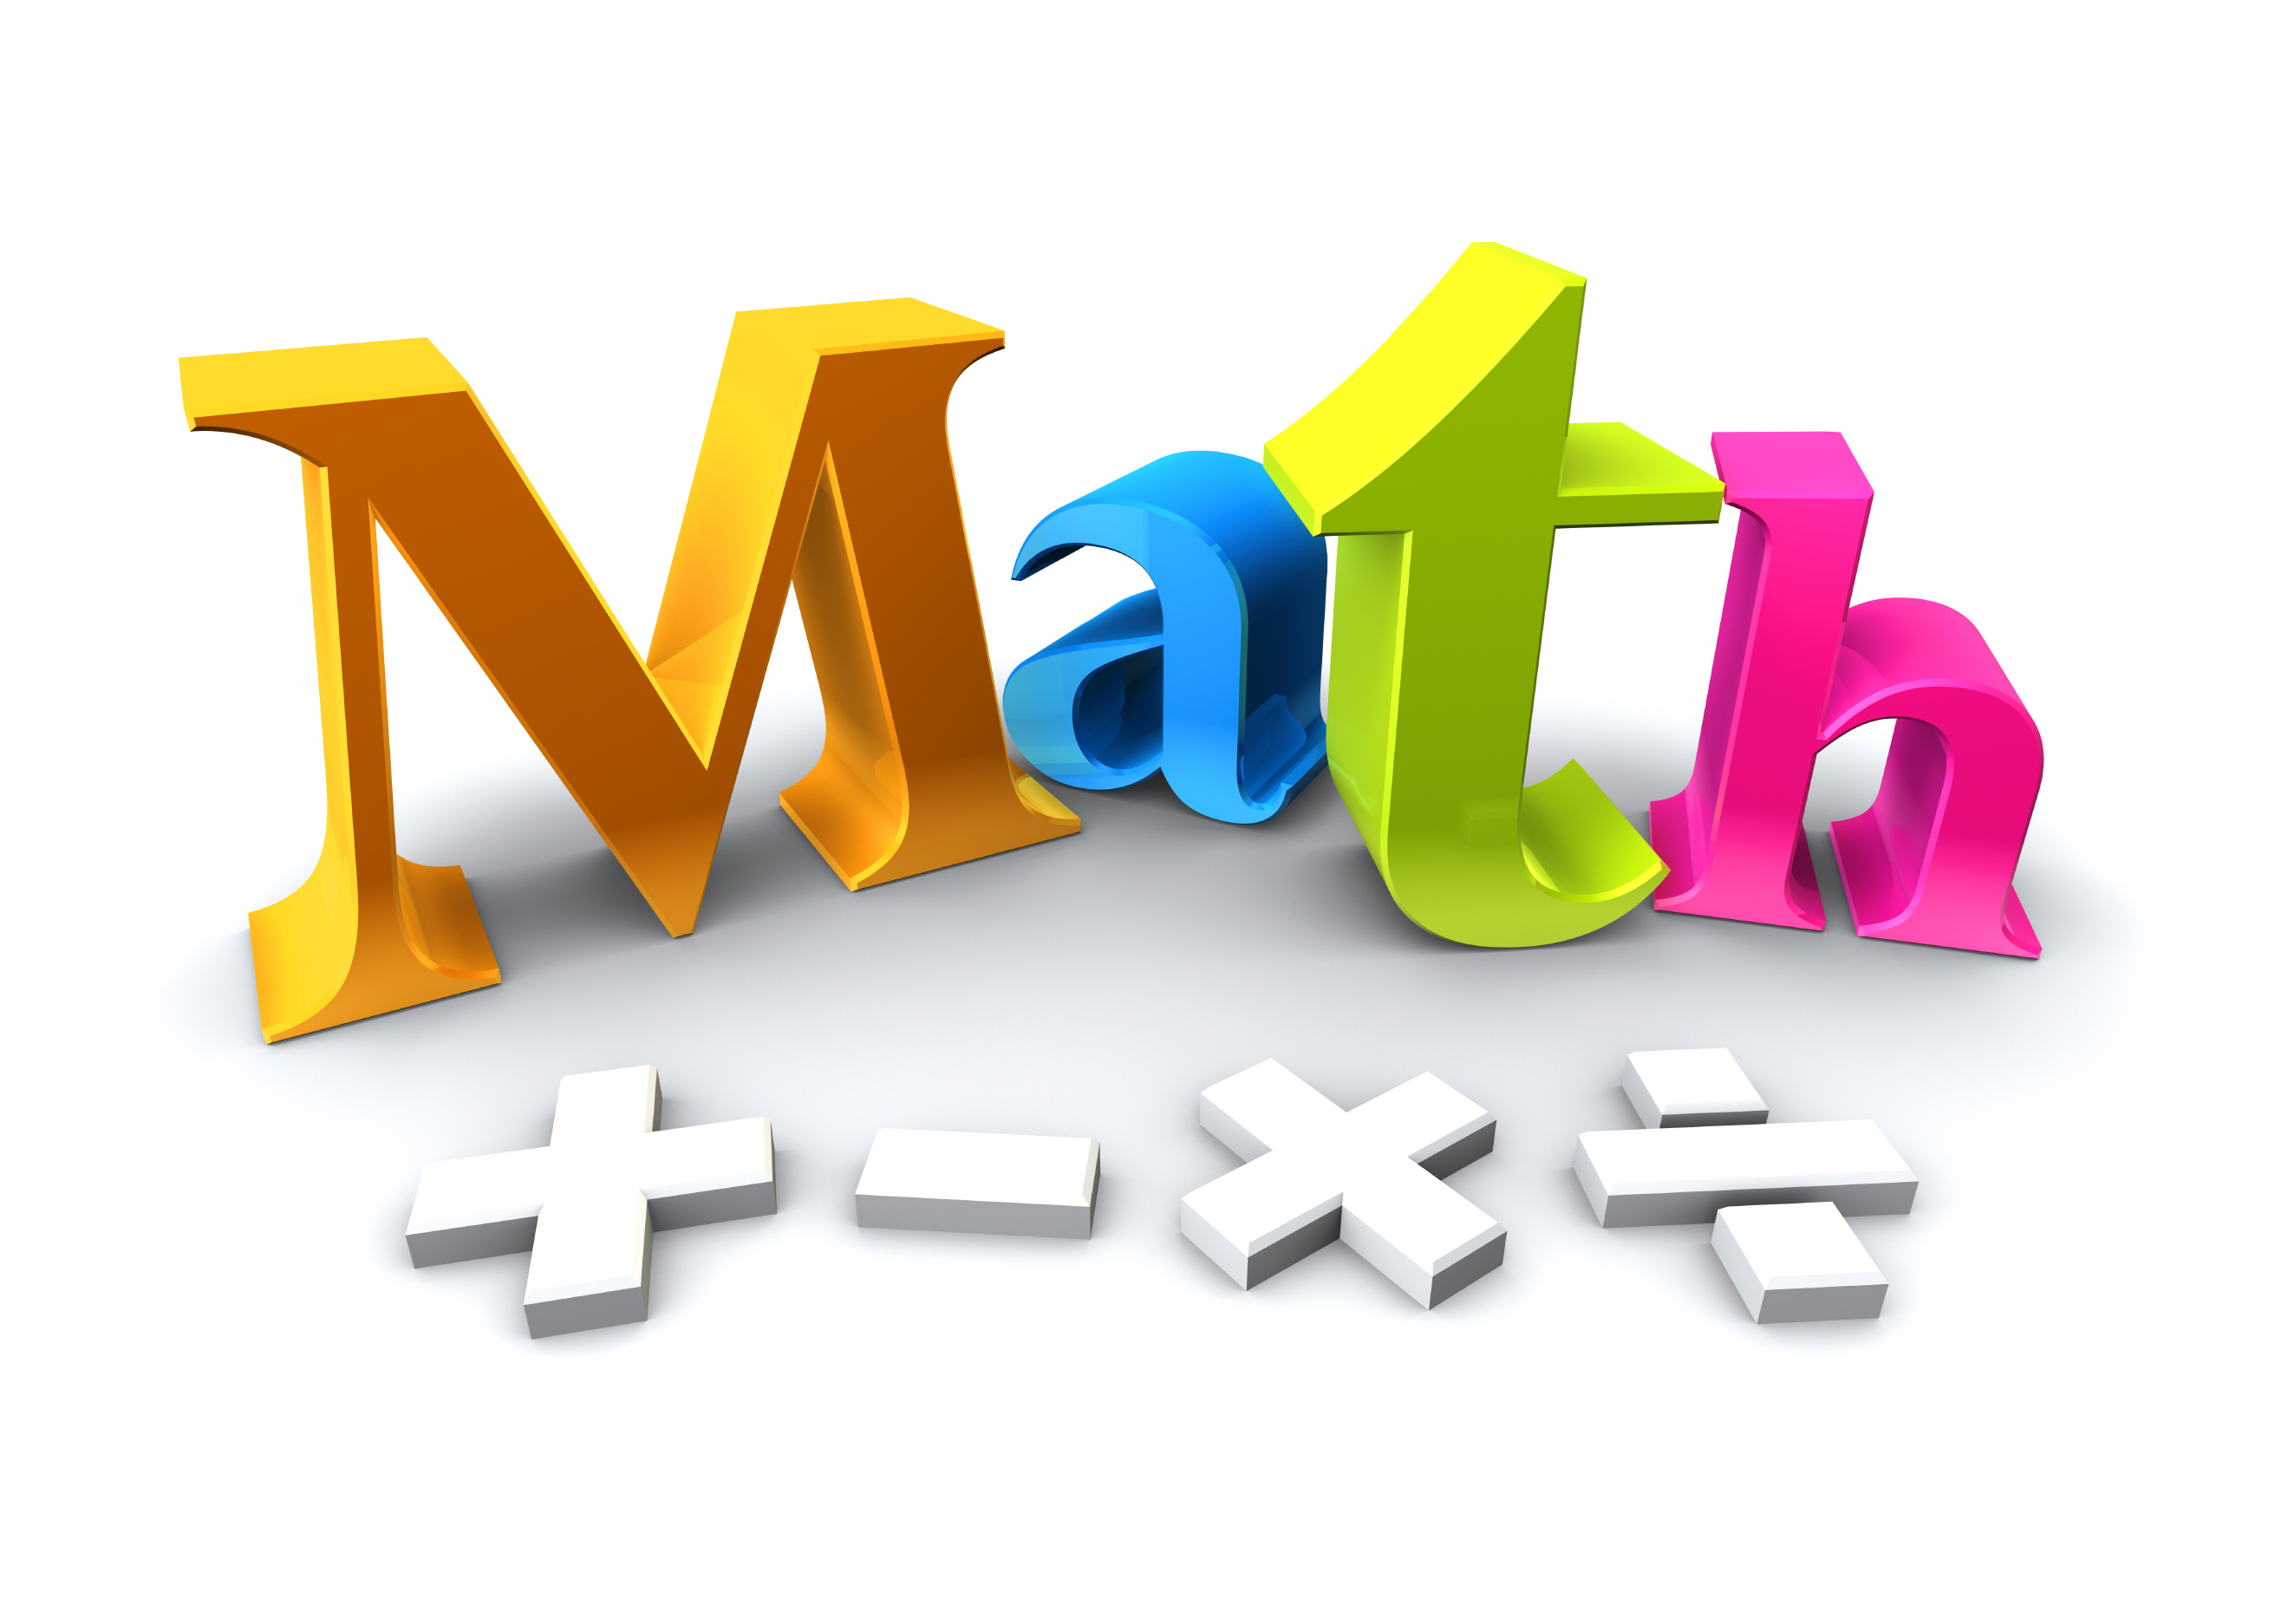 Eureka Math EQUIP 1st-5th Grade Teachers and Support Staff - GROUP #3 (VIRTUAL PD 8:00-11:00)